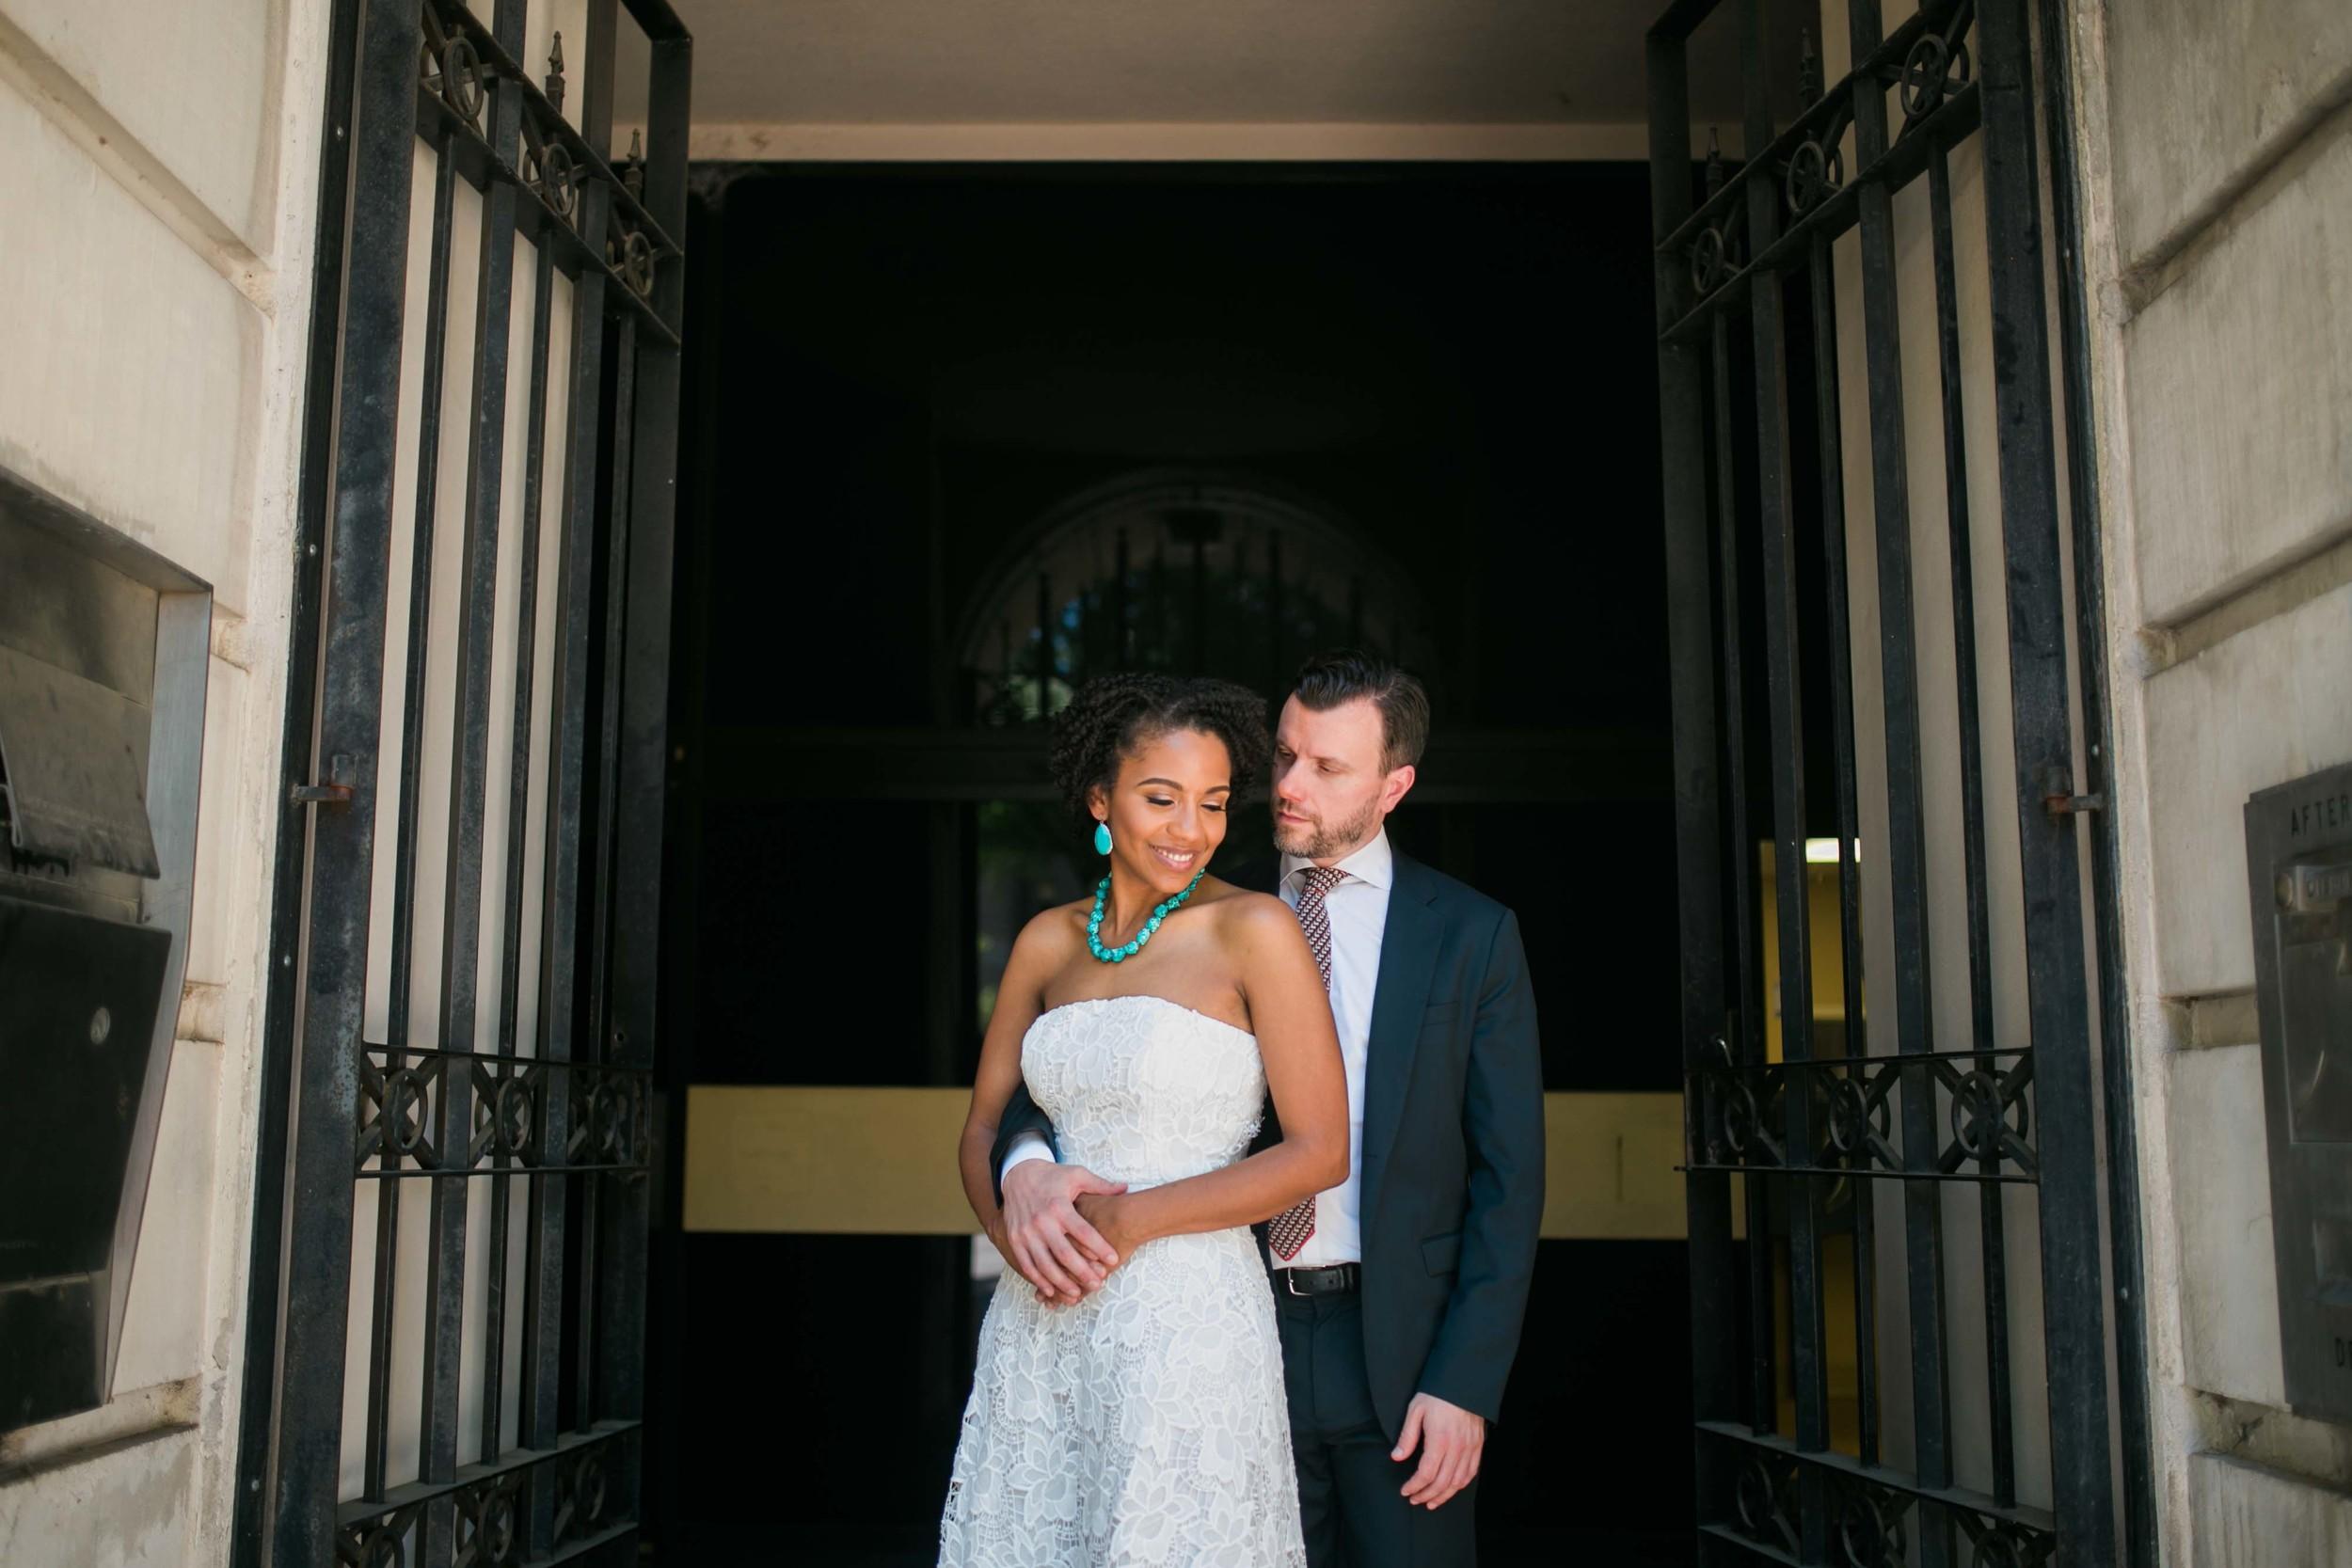 Dekalb-County-Courthouse-Wedding-Photos-Kiyah-C-Photography-57.jpg